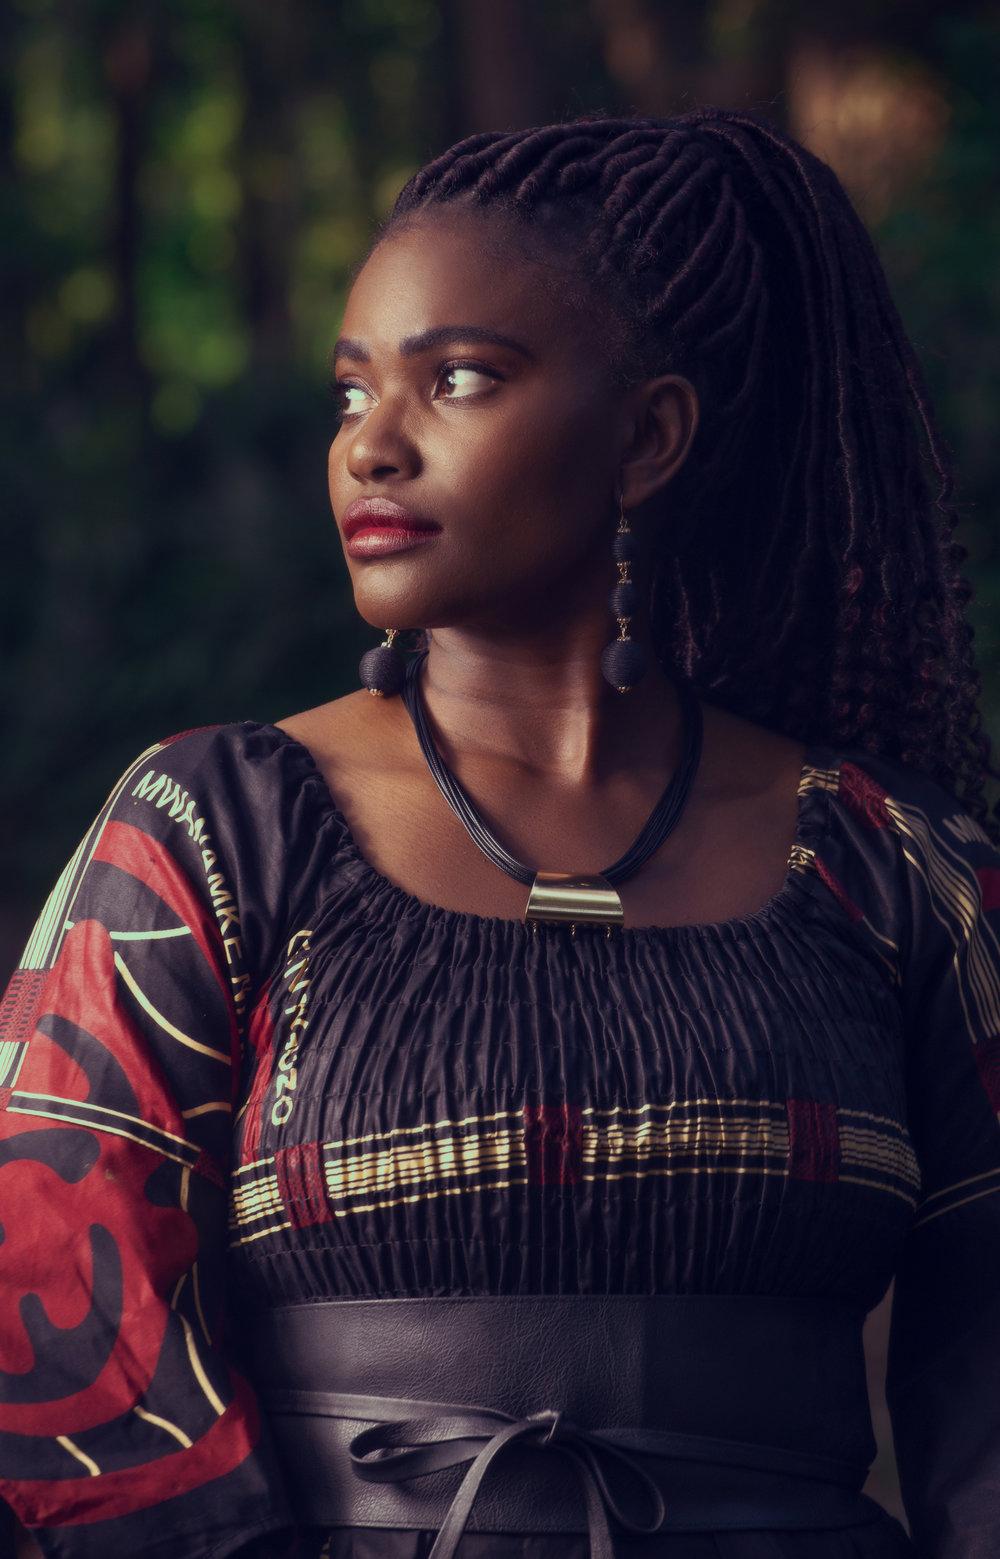 bridgette-african-nigerian-chamber-photography-photo-shoot1.jpg